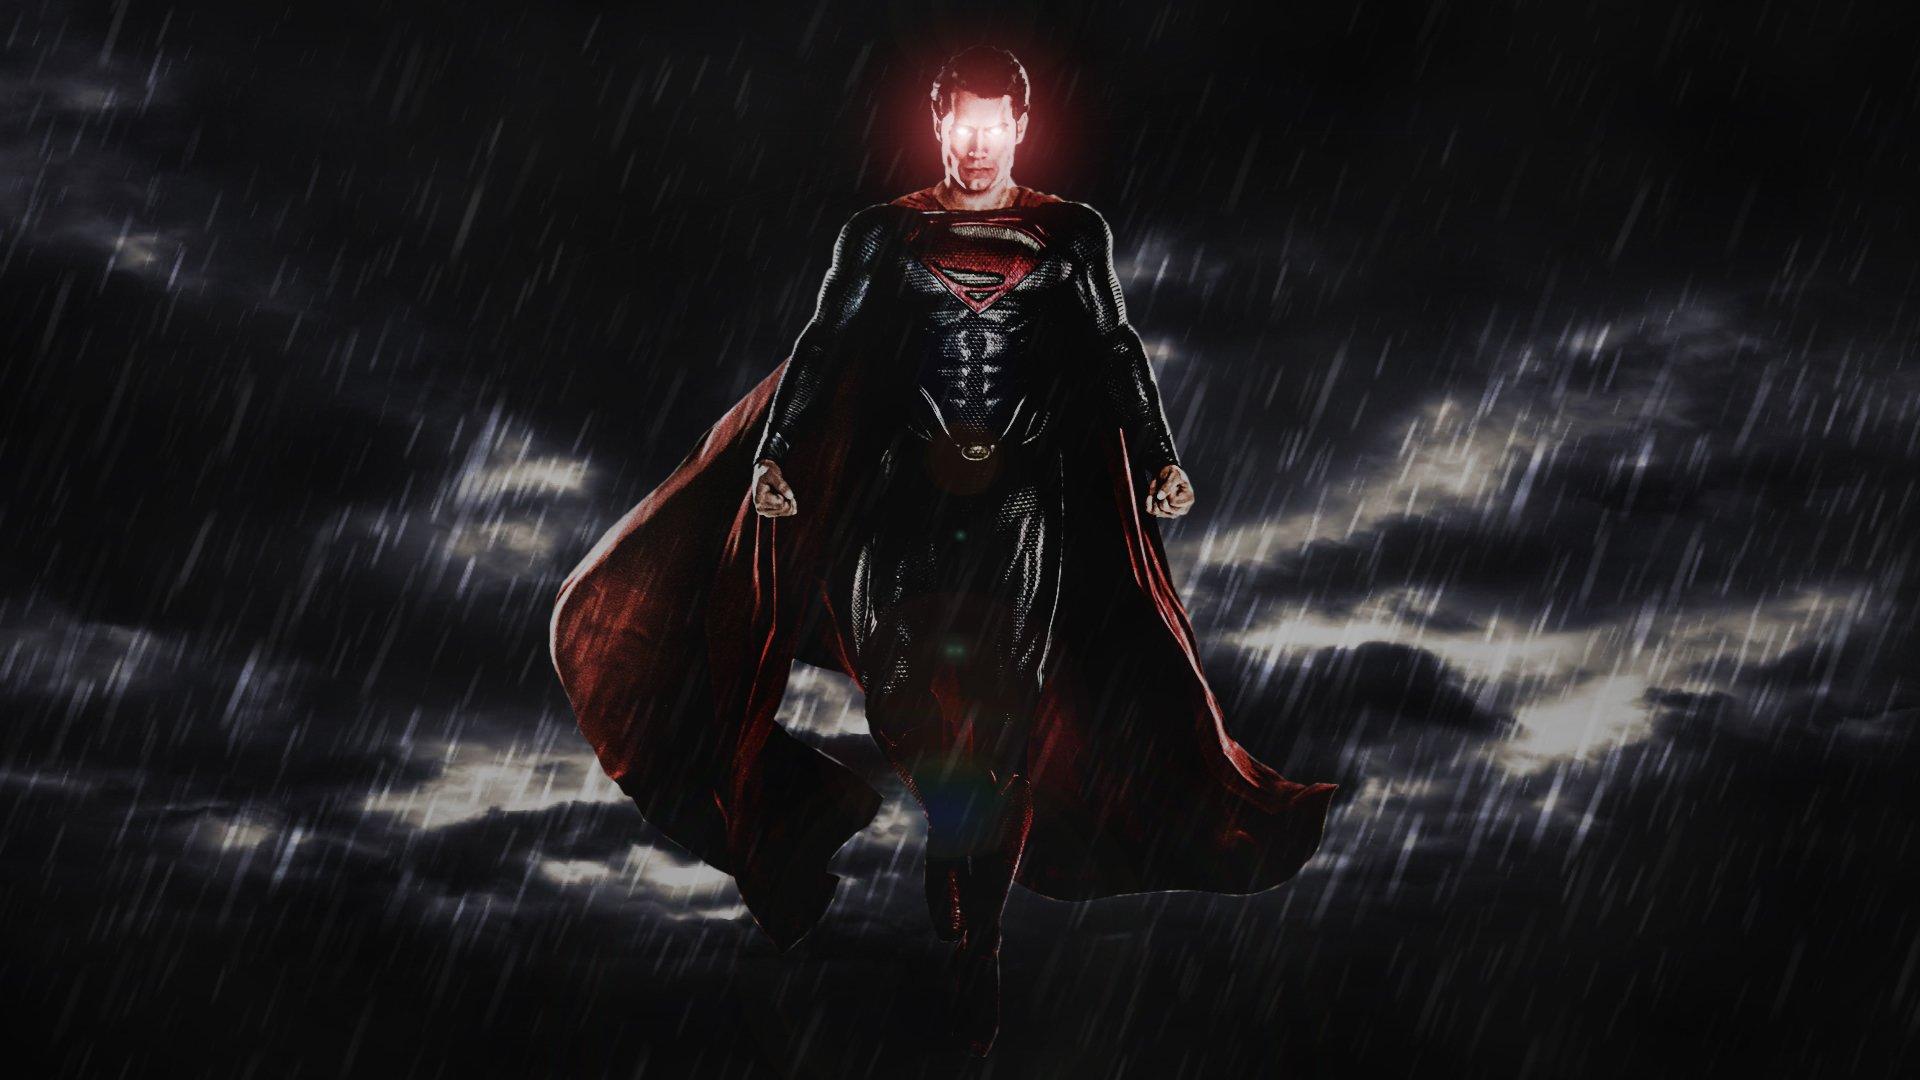 Batman v superman comic con superman poster by ...